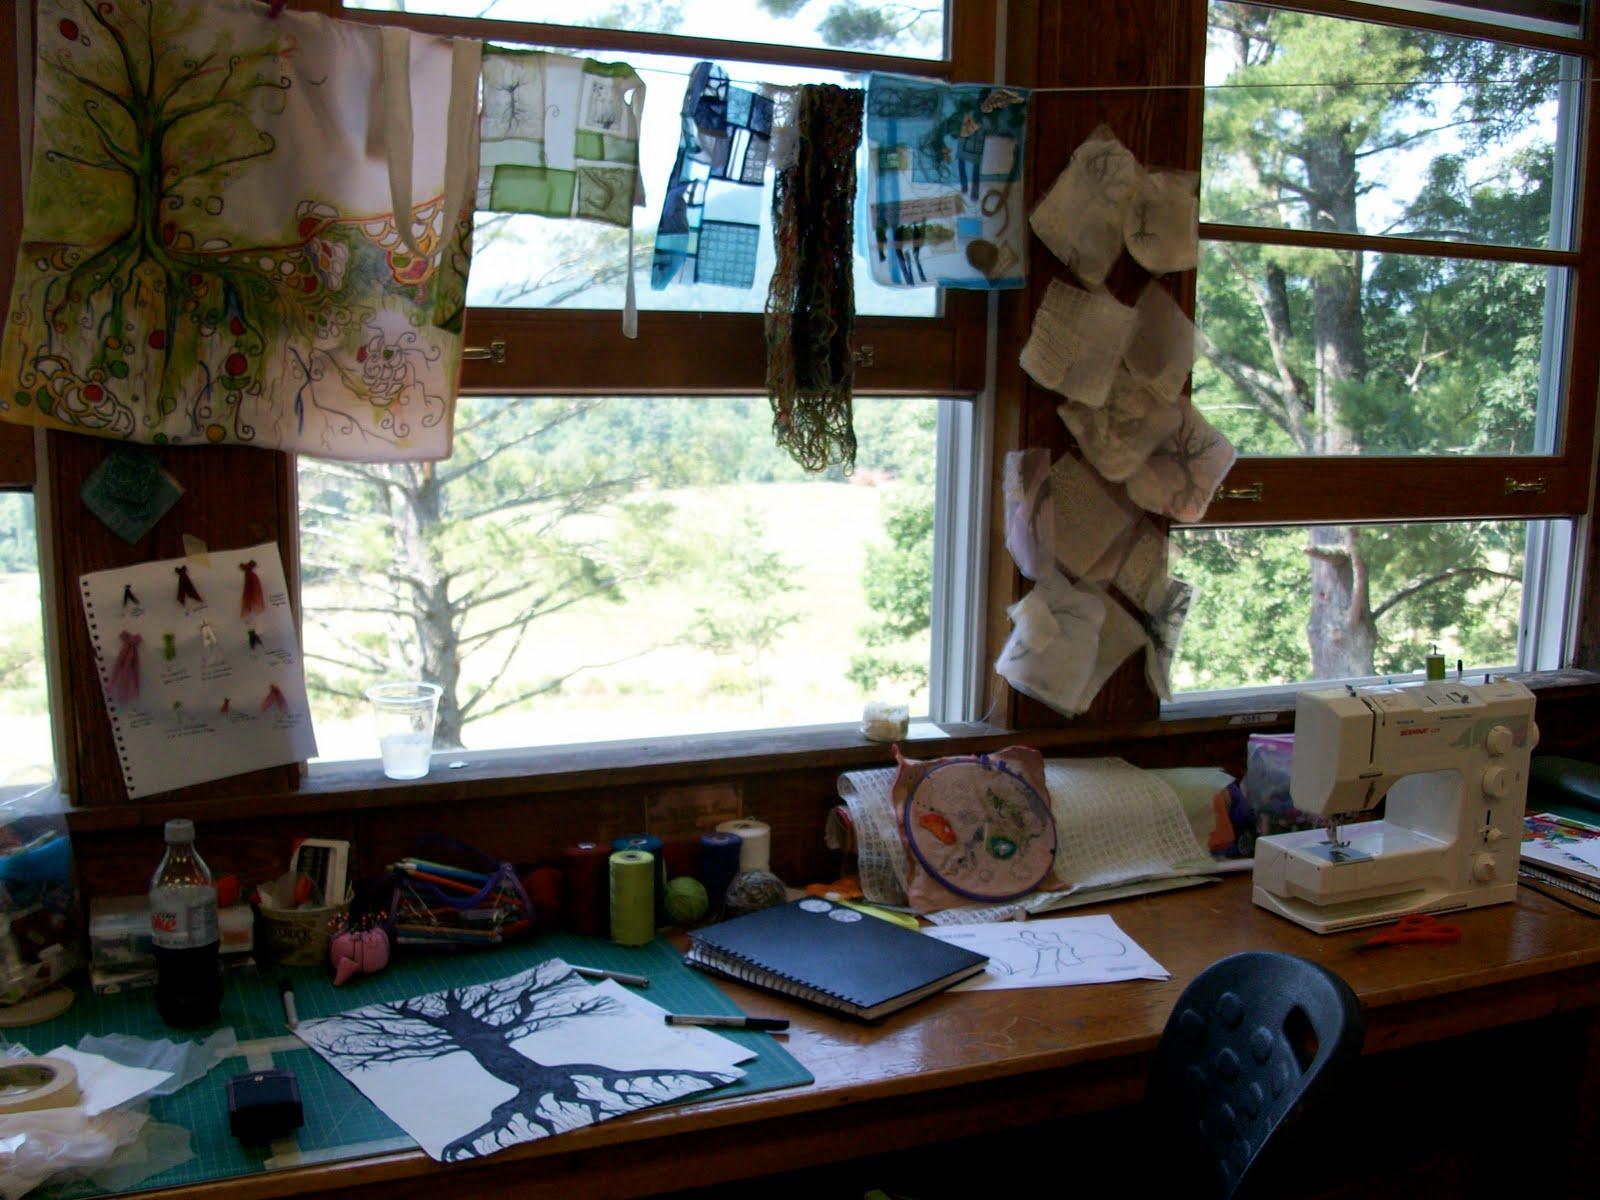 Fellowship Crafts And Hobbies